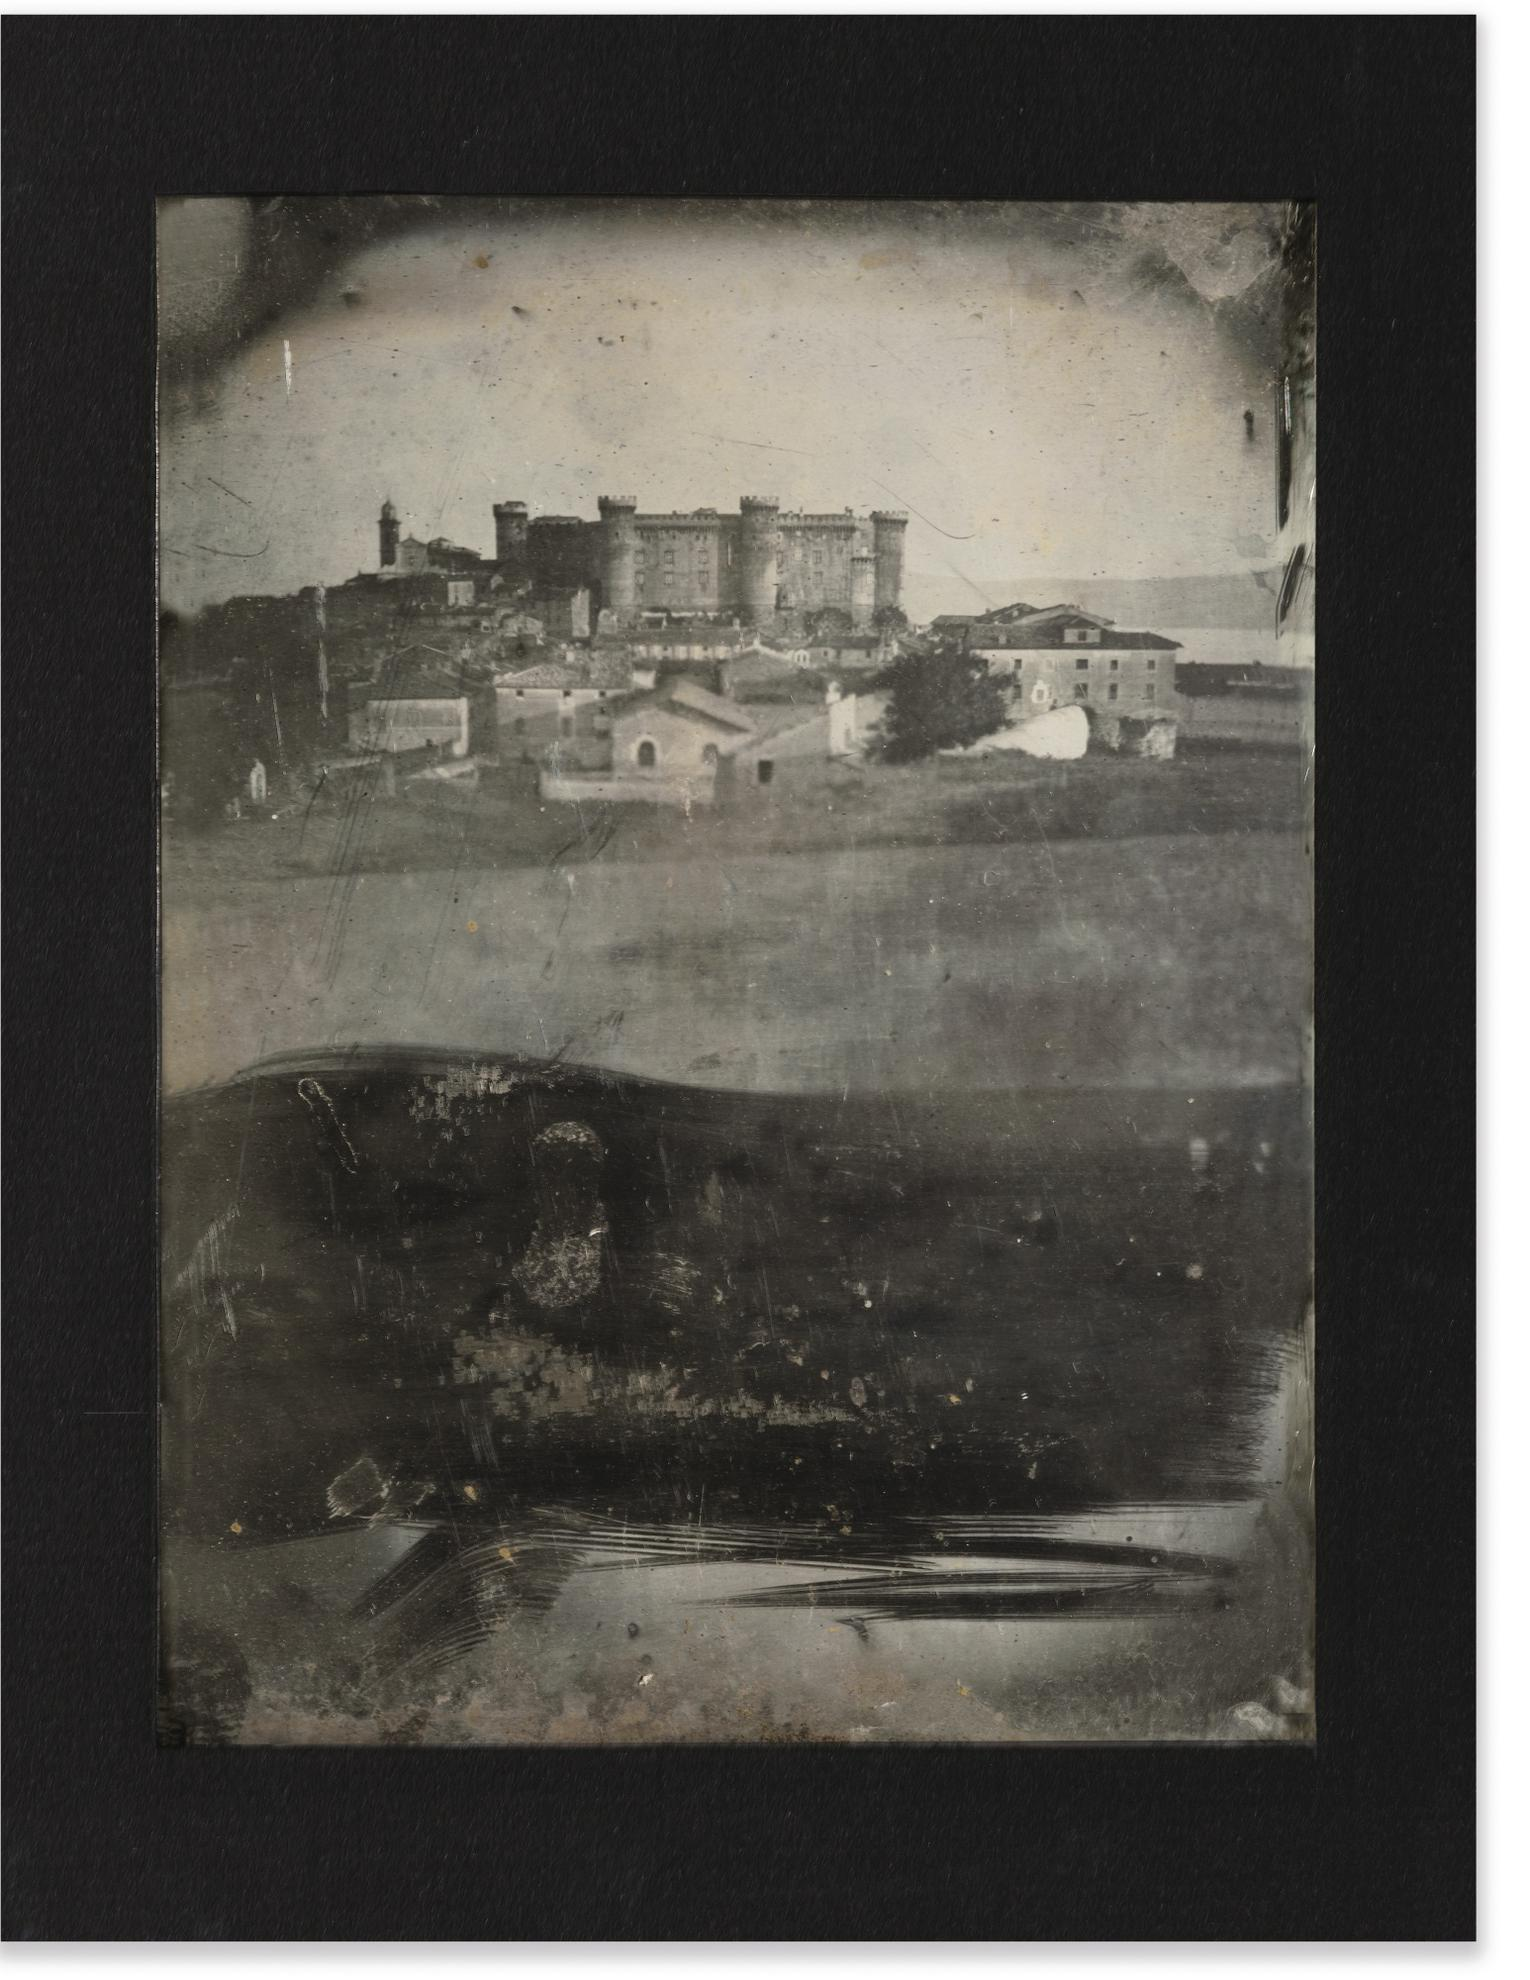 Joseph Philibert Girault De Prangey - Le Chateau Orsini-Odescalchi, Bracciano-1842